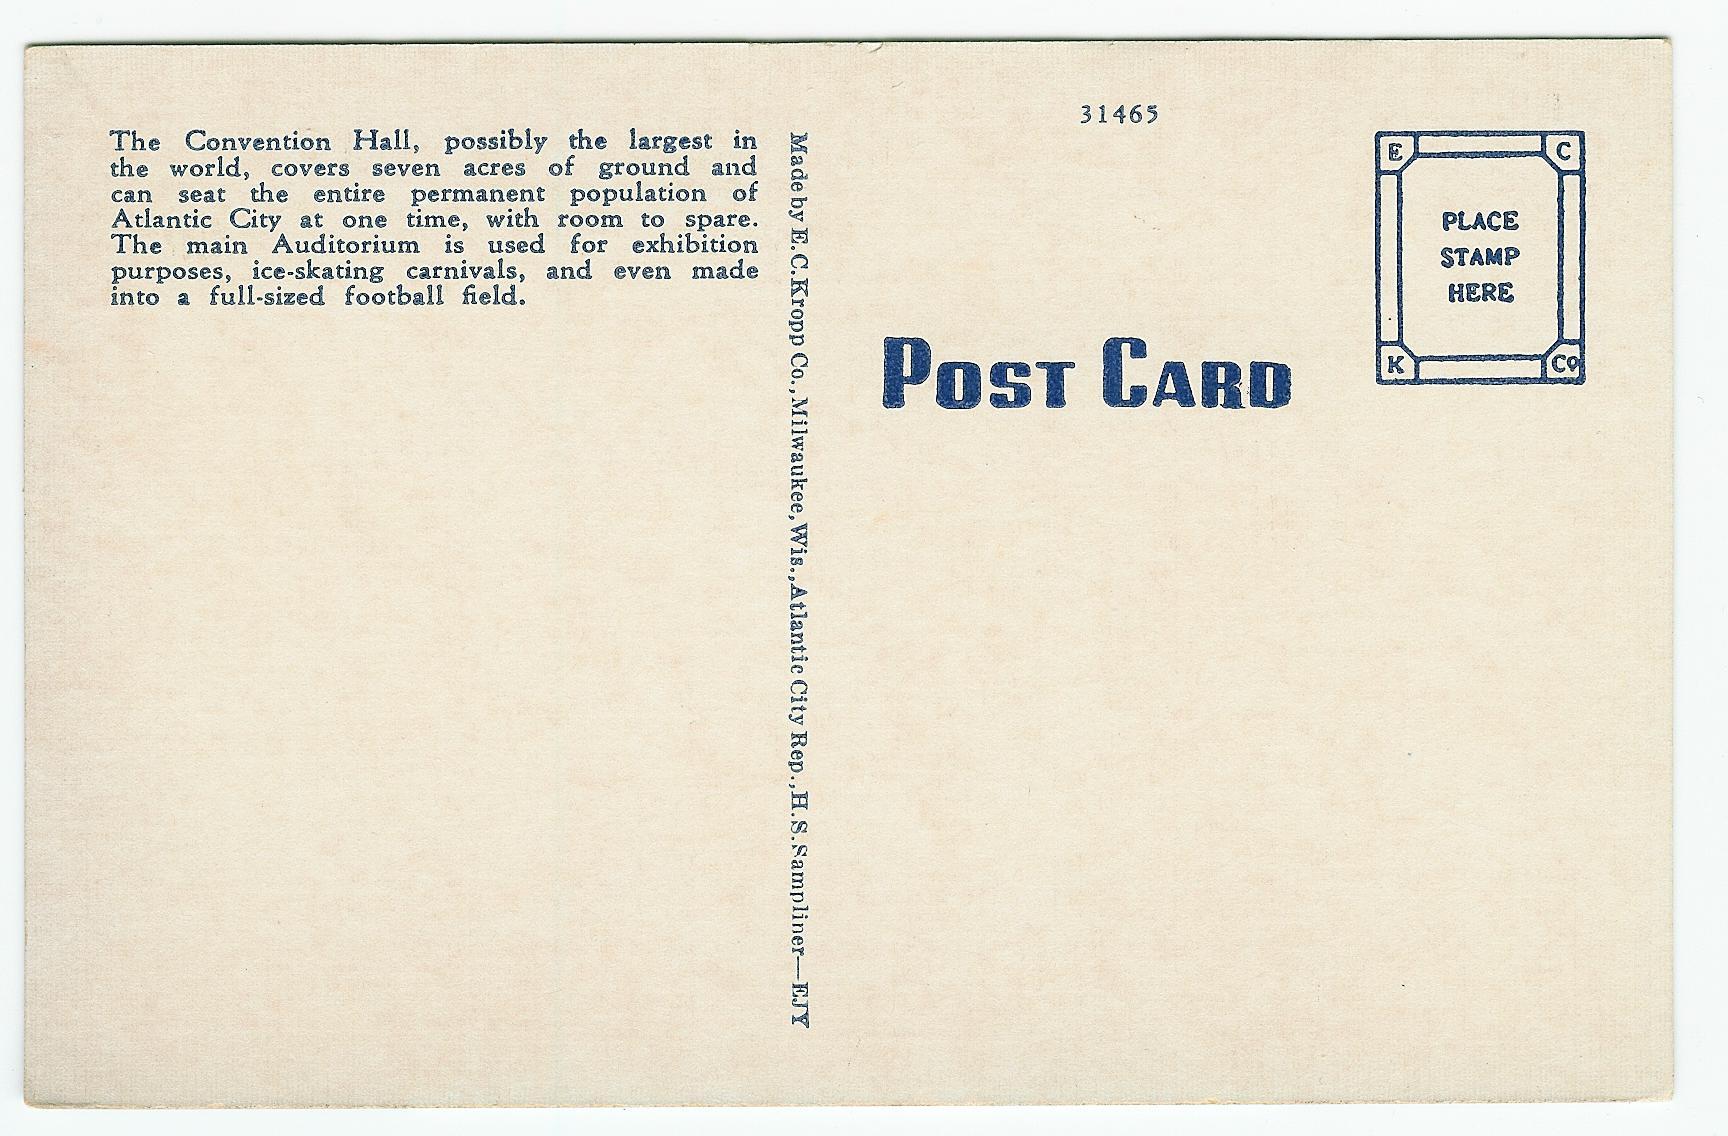 Modern Sale Convention Hall By Atlantic Reverse Postcard Blog International Postcard Stamps Postcard Stamps Auditorium inspiration Post Card Stamps